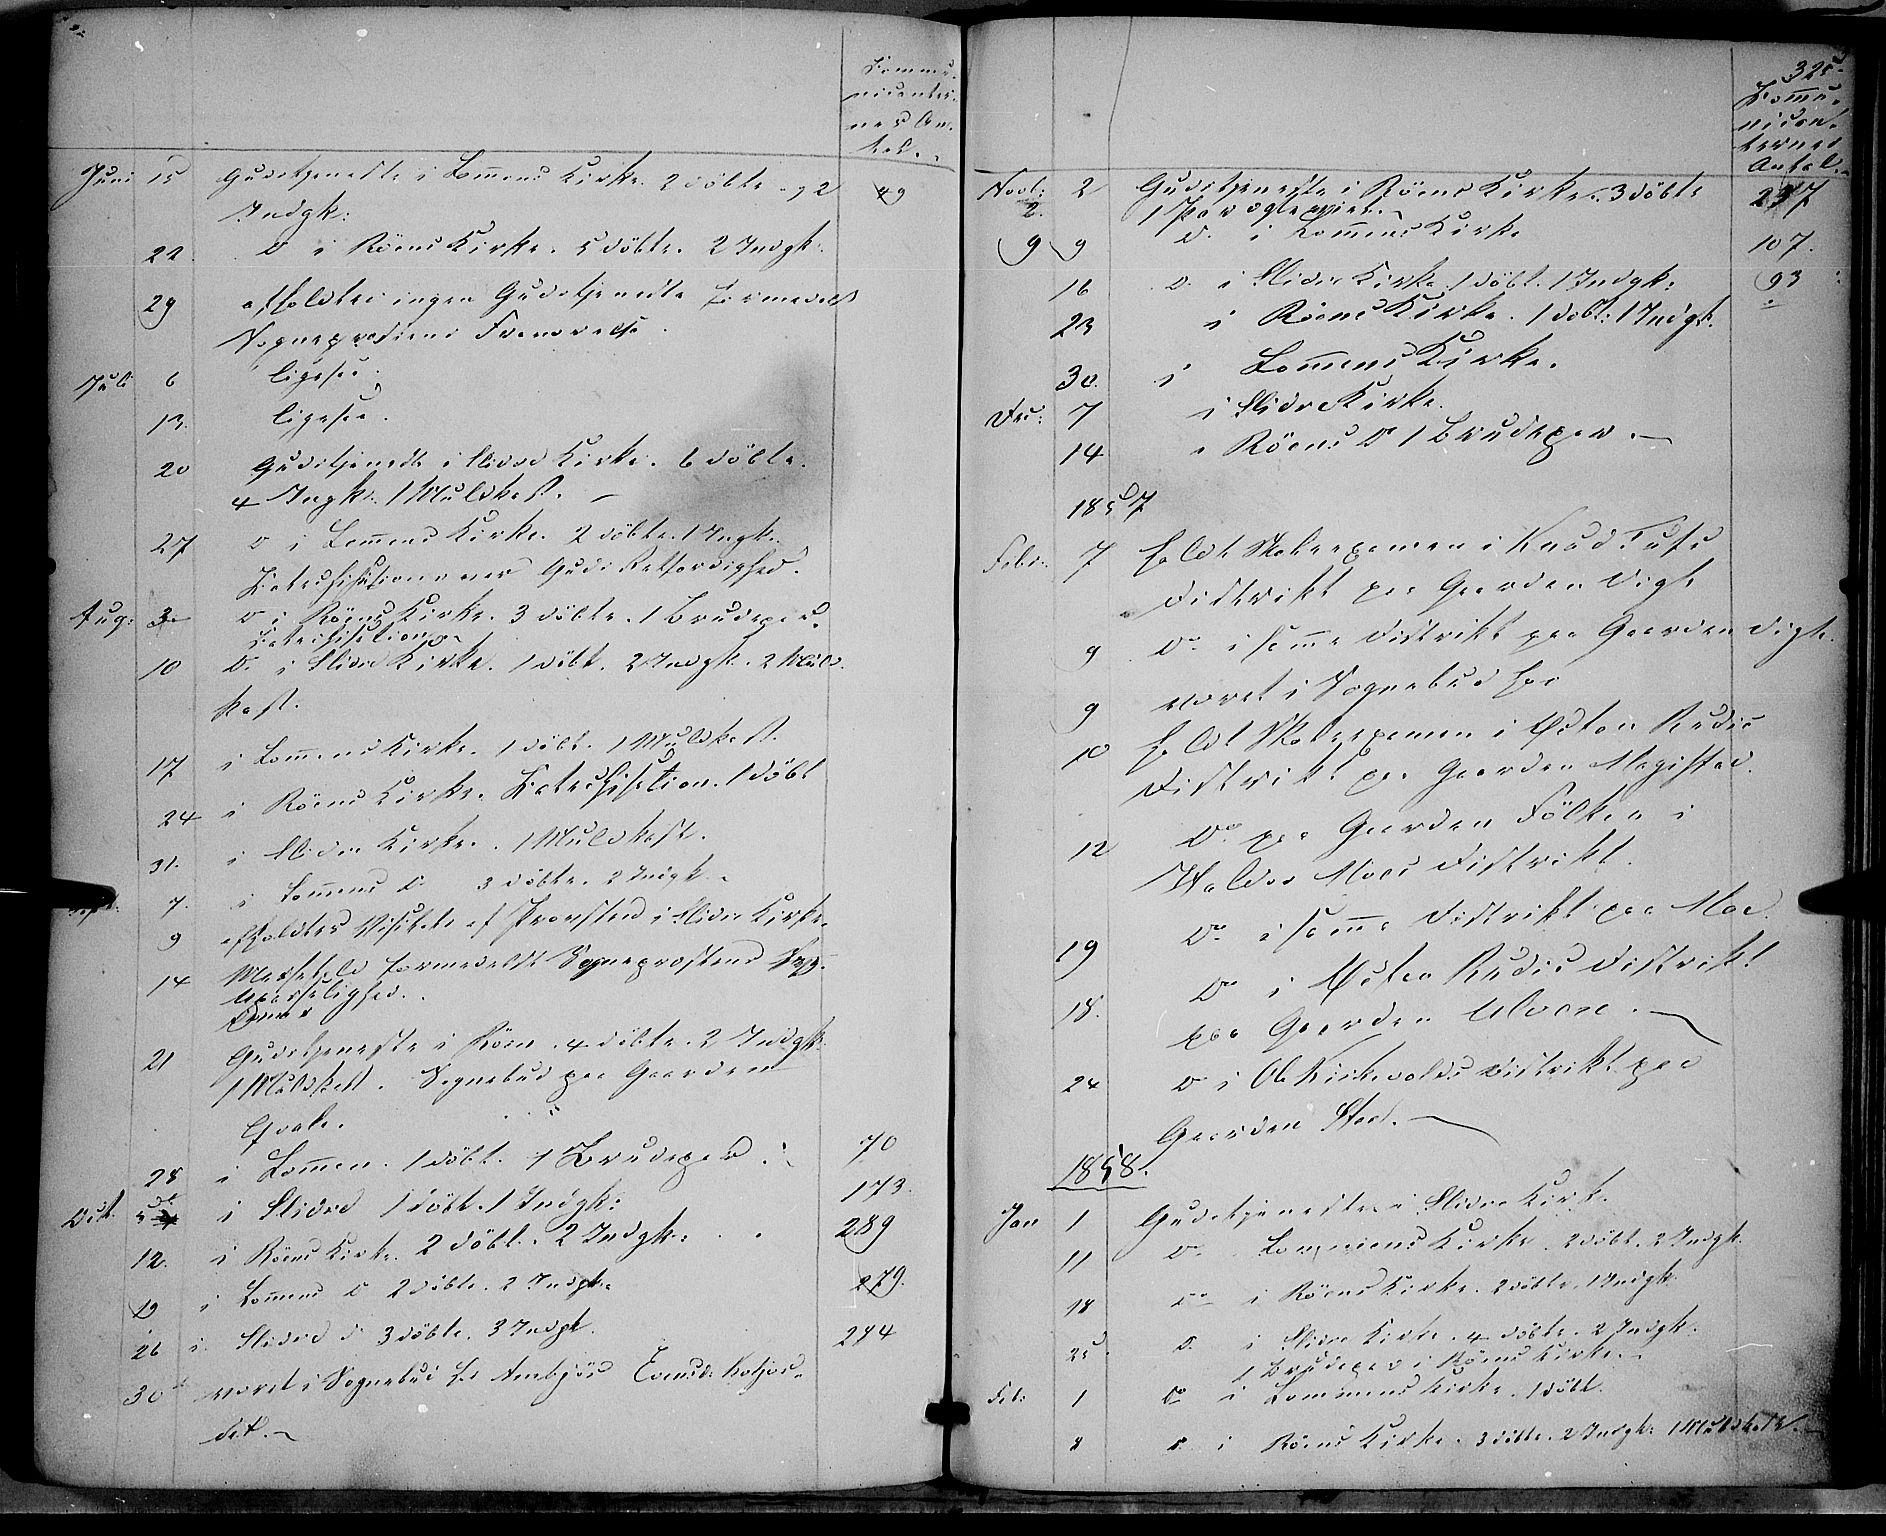 SAH, Vestre Slidre prestekontor, Ministerialbok nr. 2, 1856-1864, s. 325